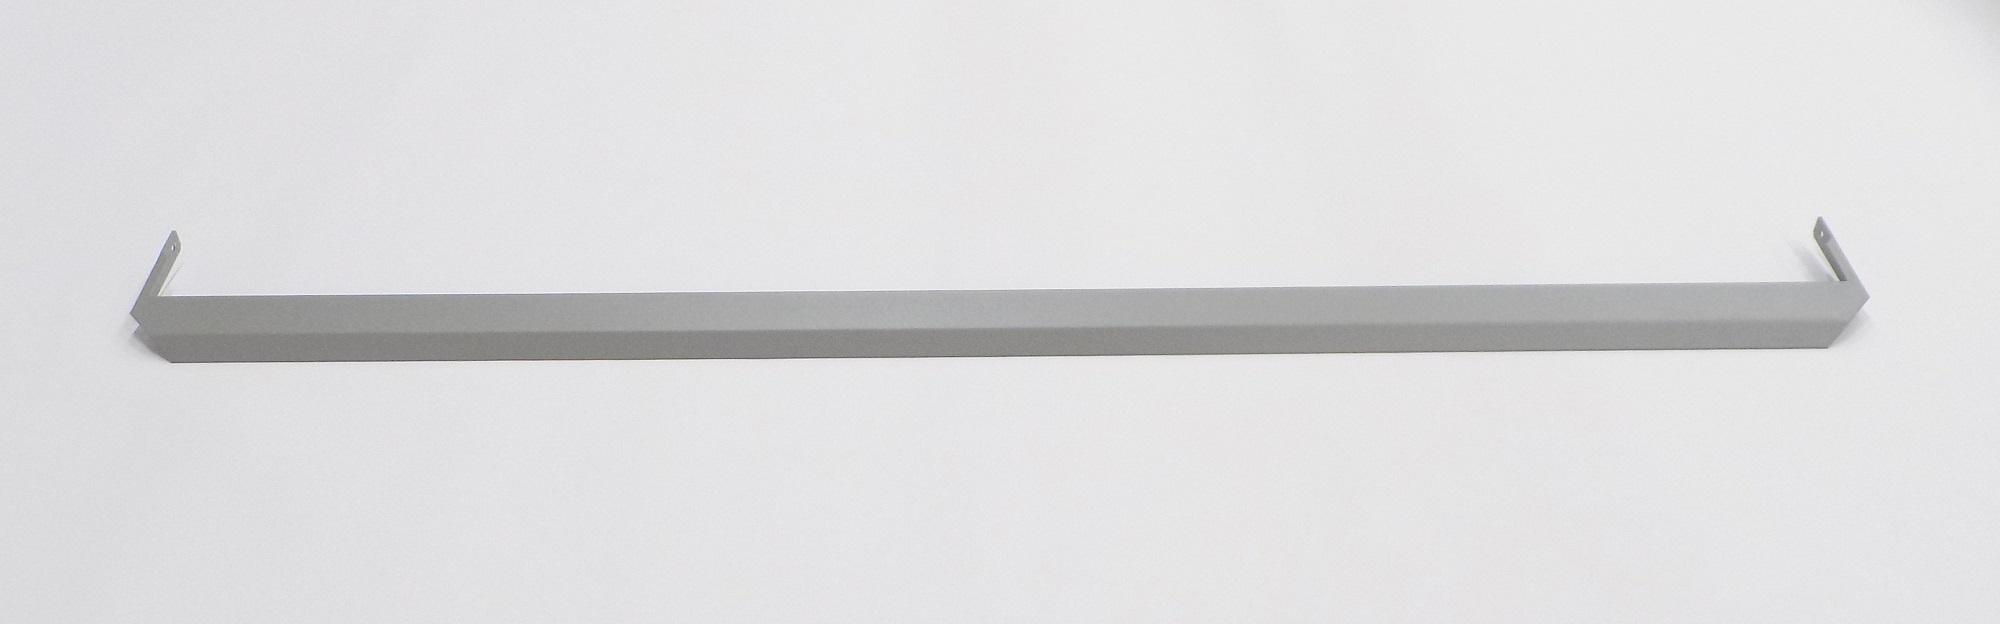 GX8001